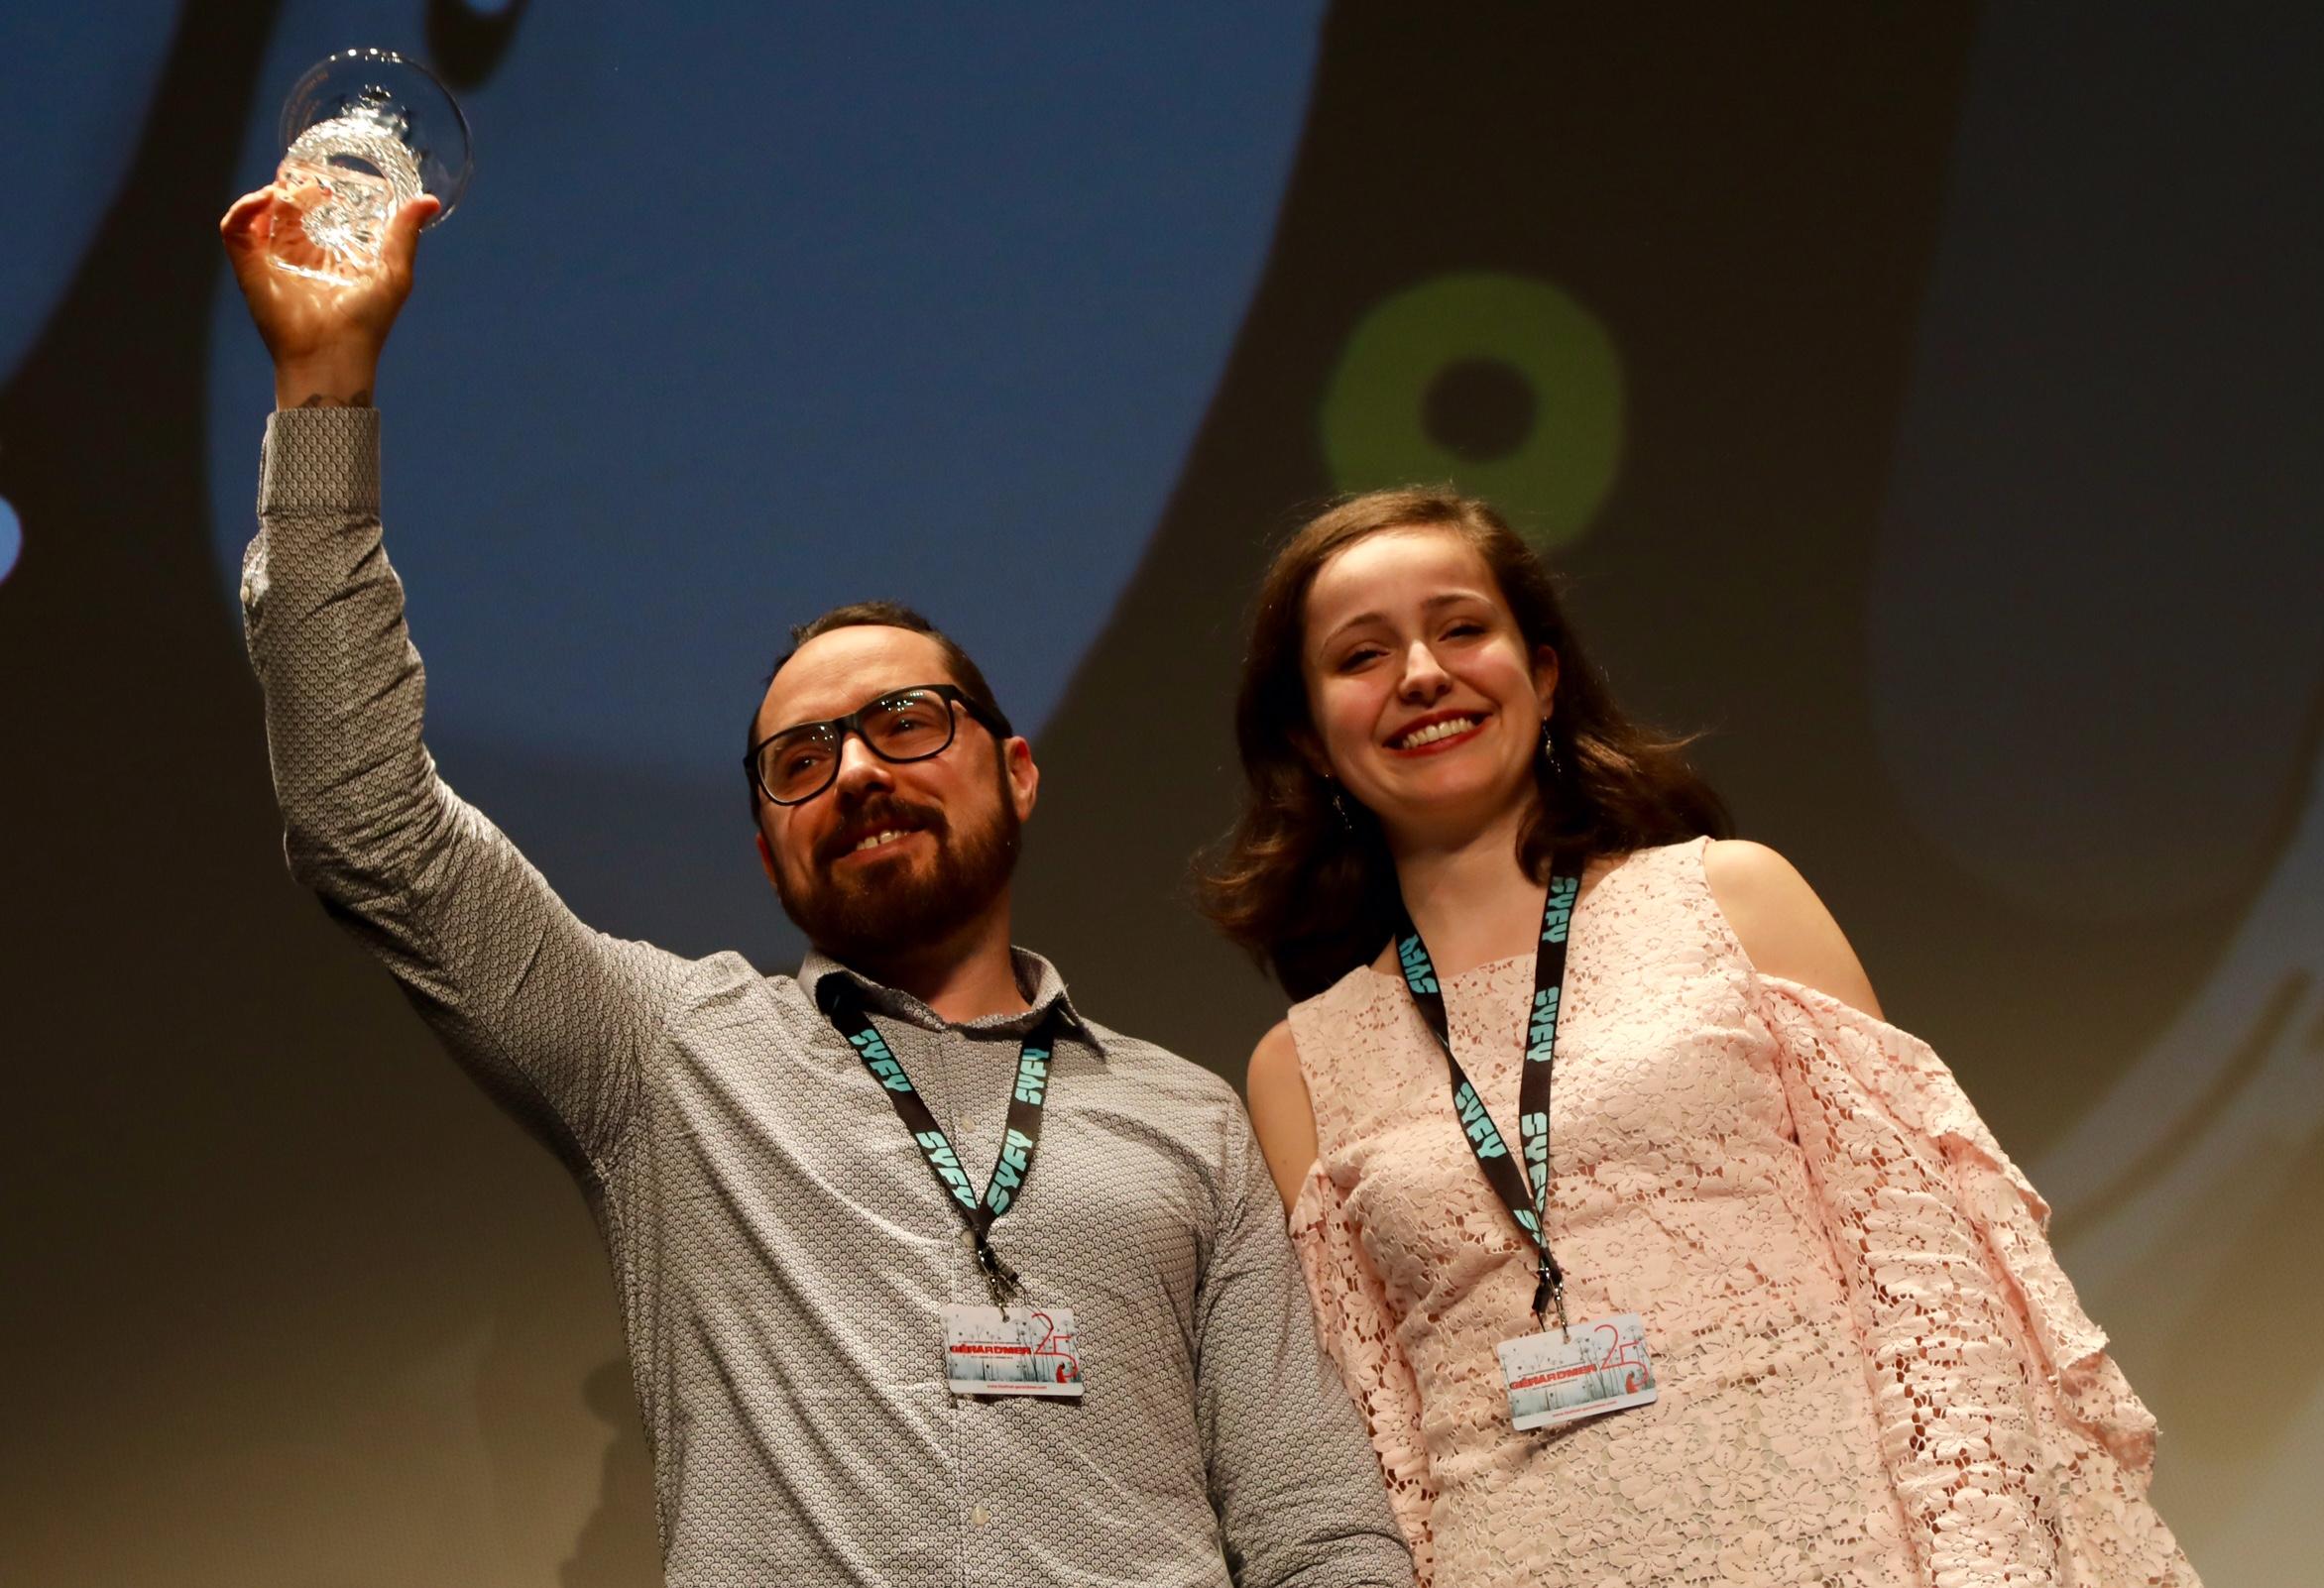 Remise_prix_Jury_Jeunes_Mutafukaz_copyright_Bodez_Region_Grand_Est